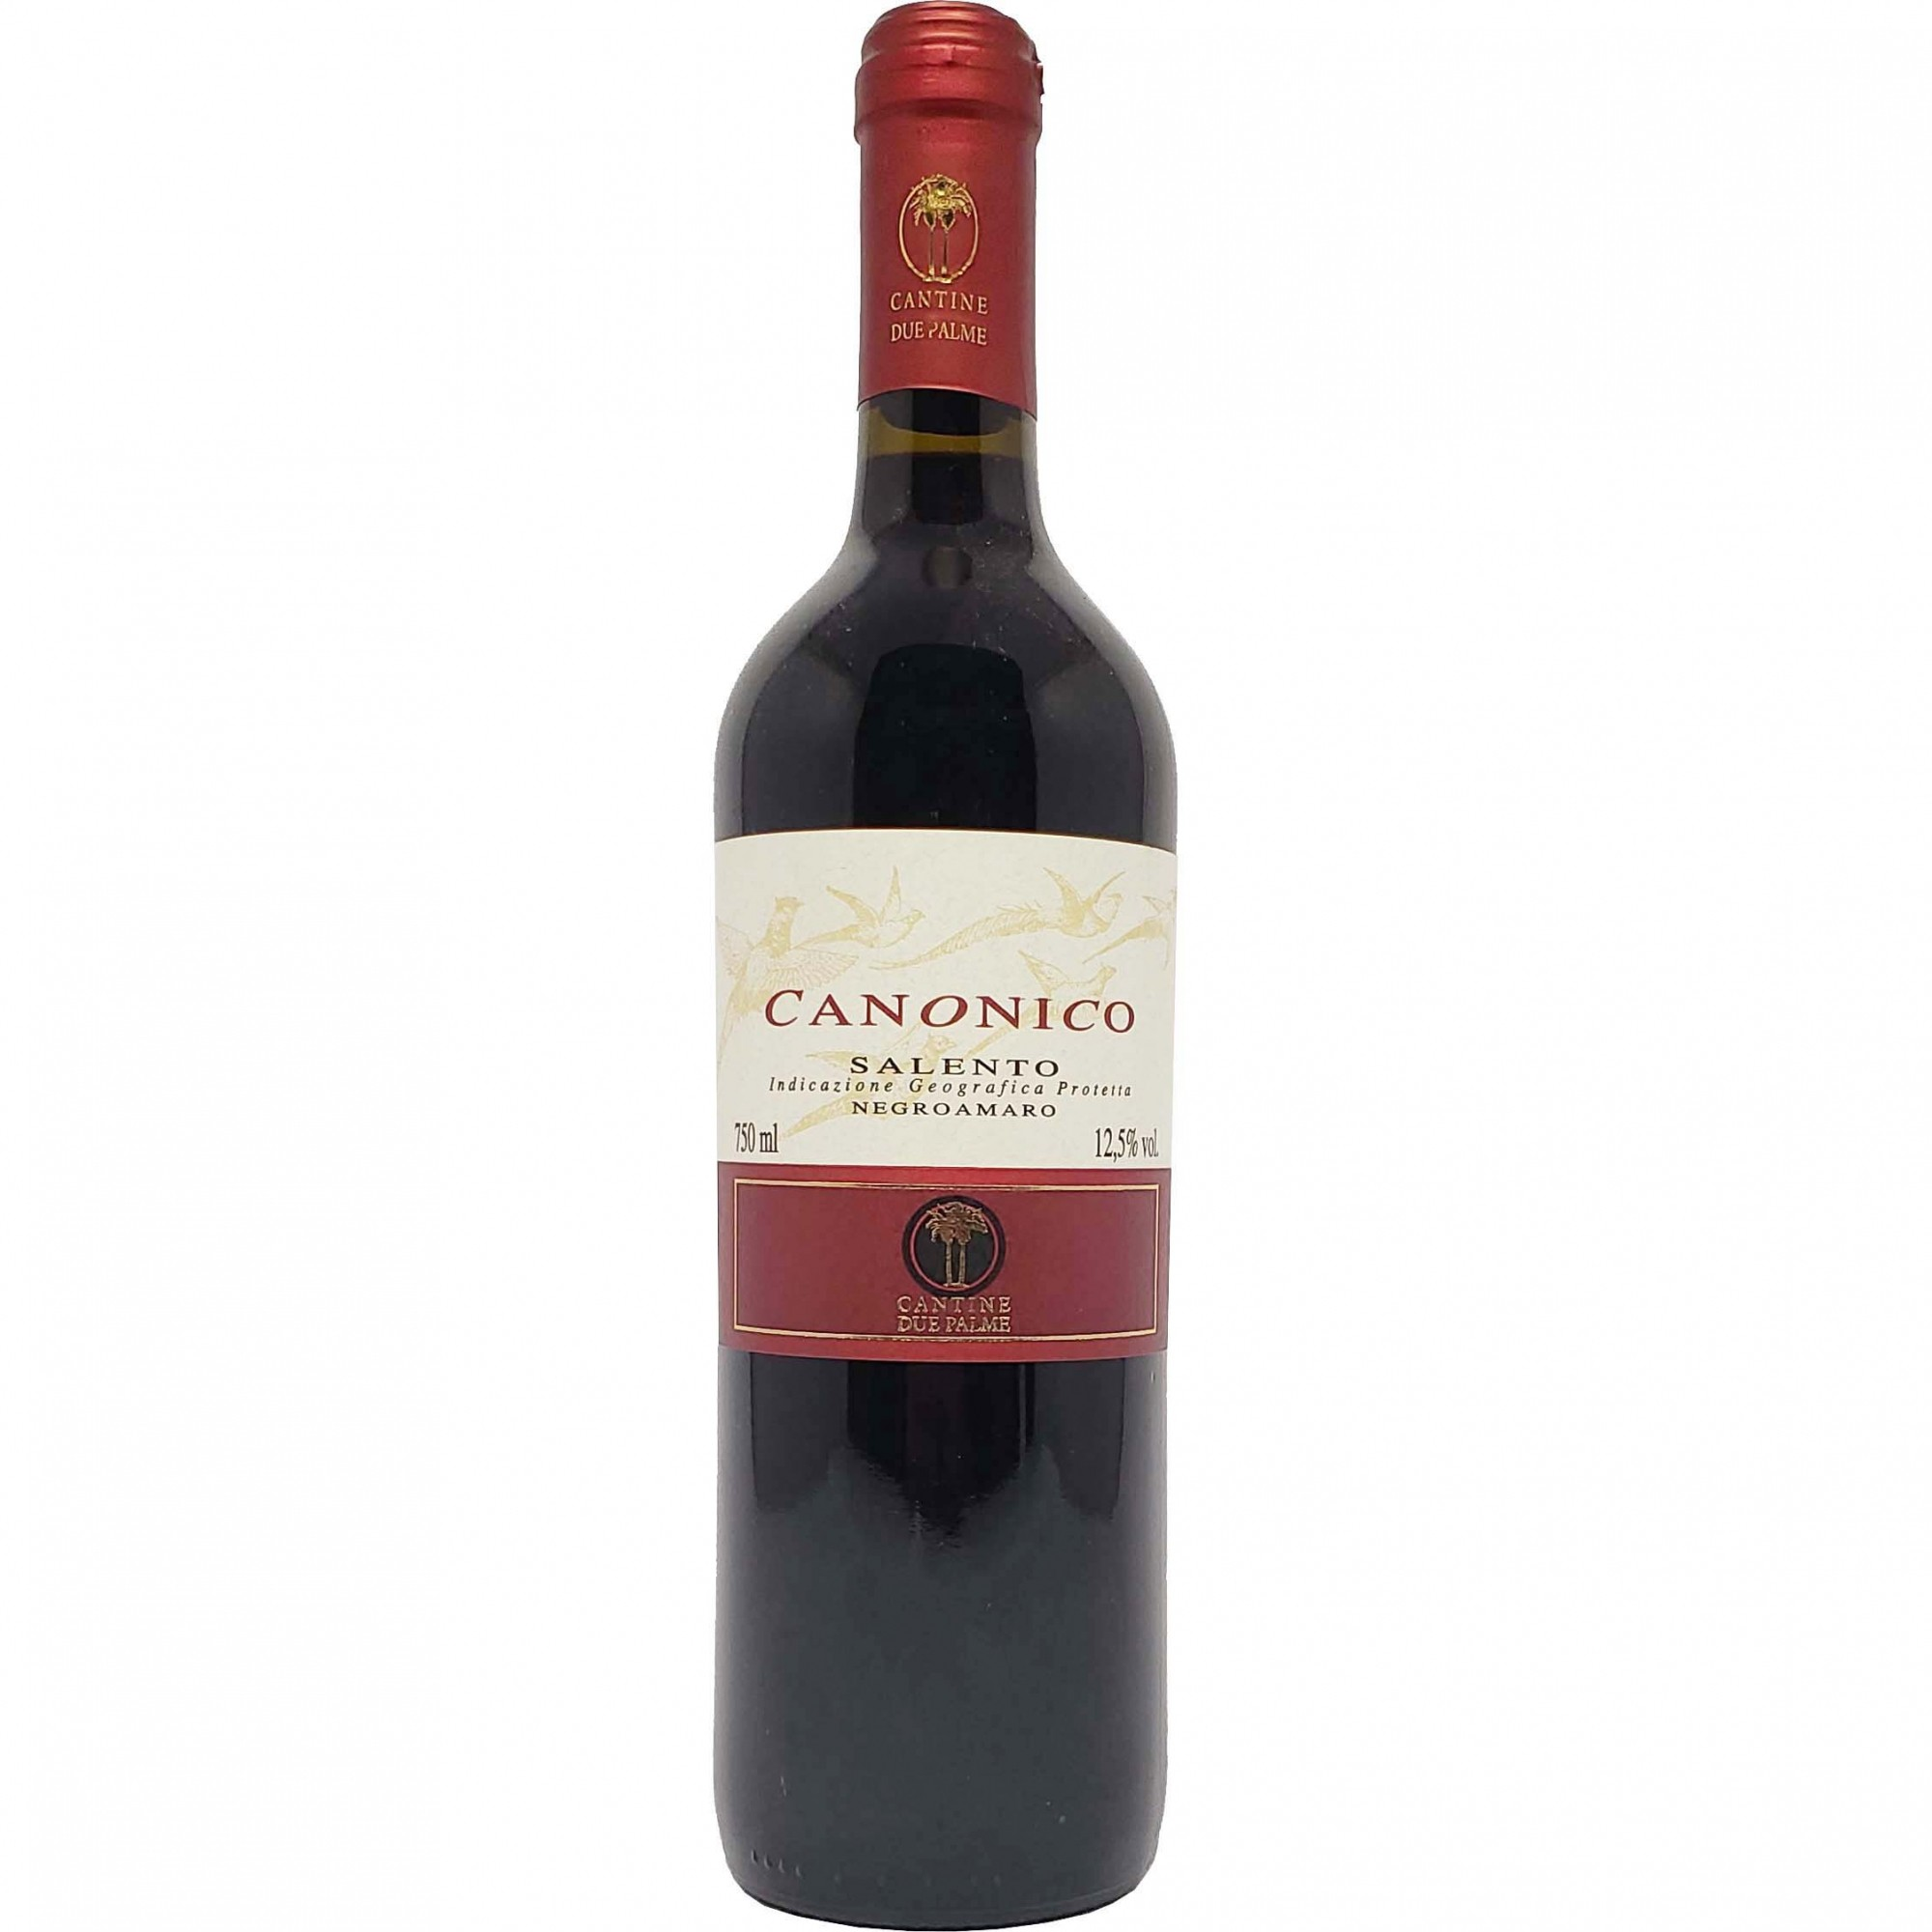 Vinho Tinto Canonico Negroamaro Salento IGP - 750ml -